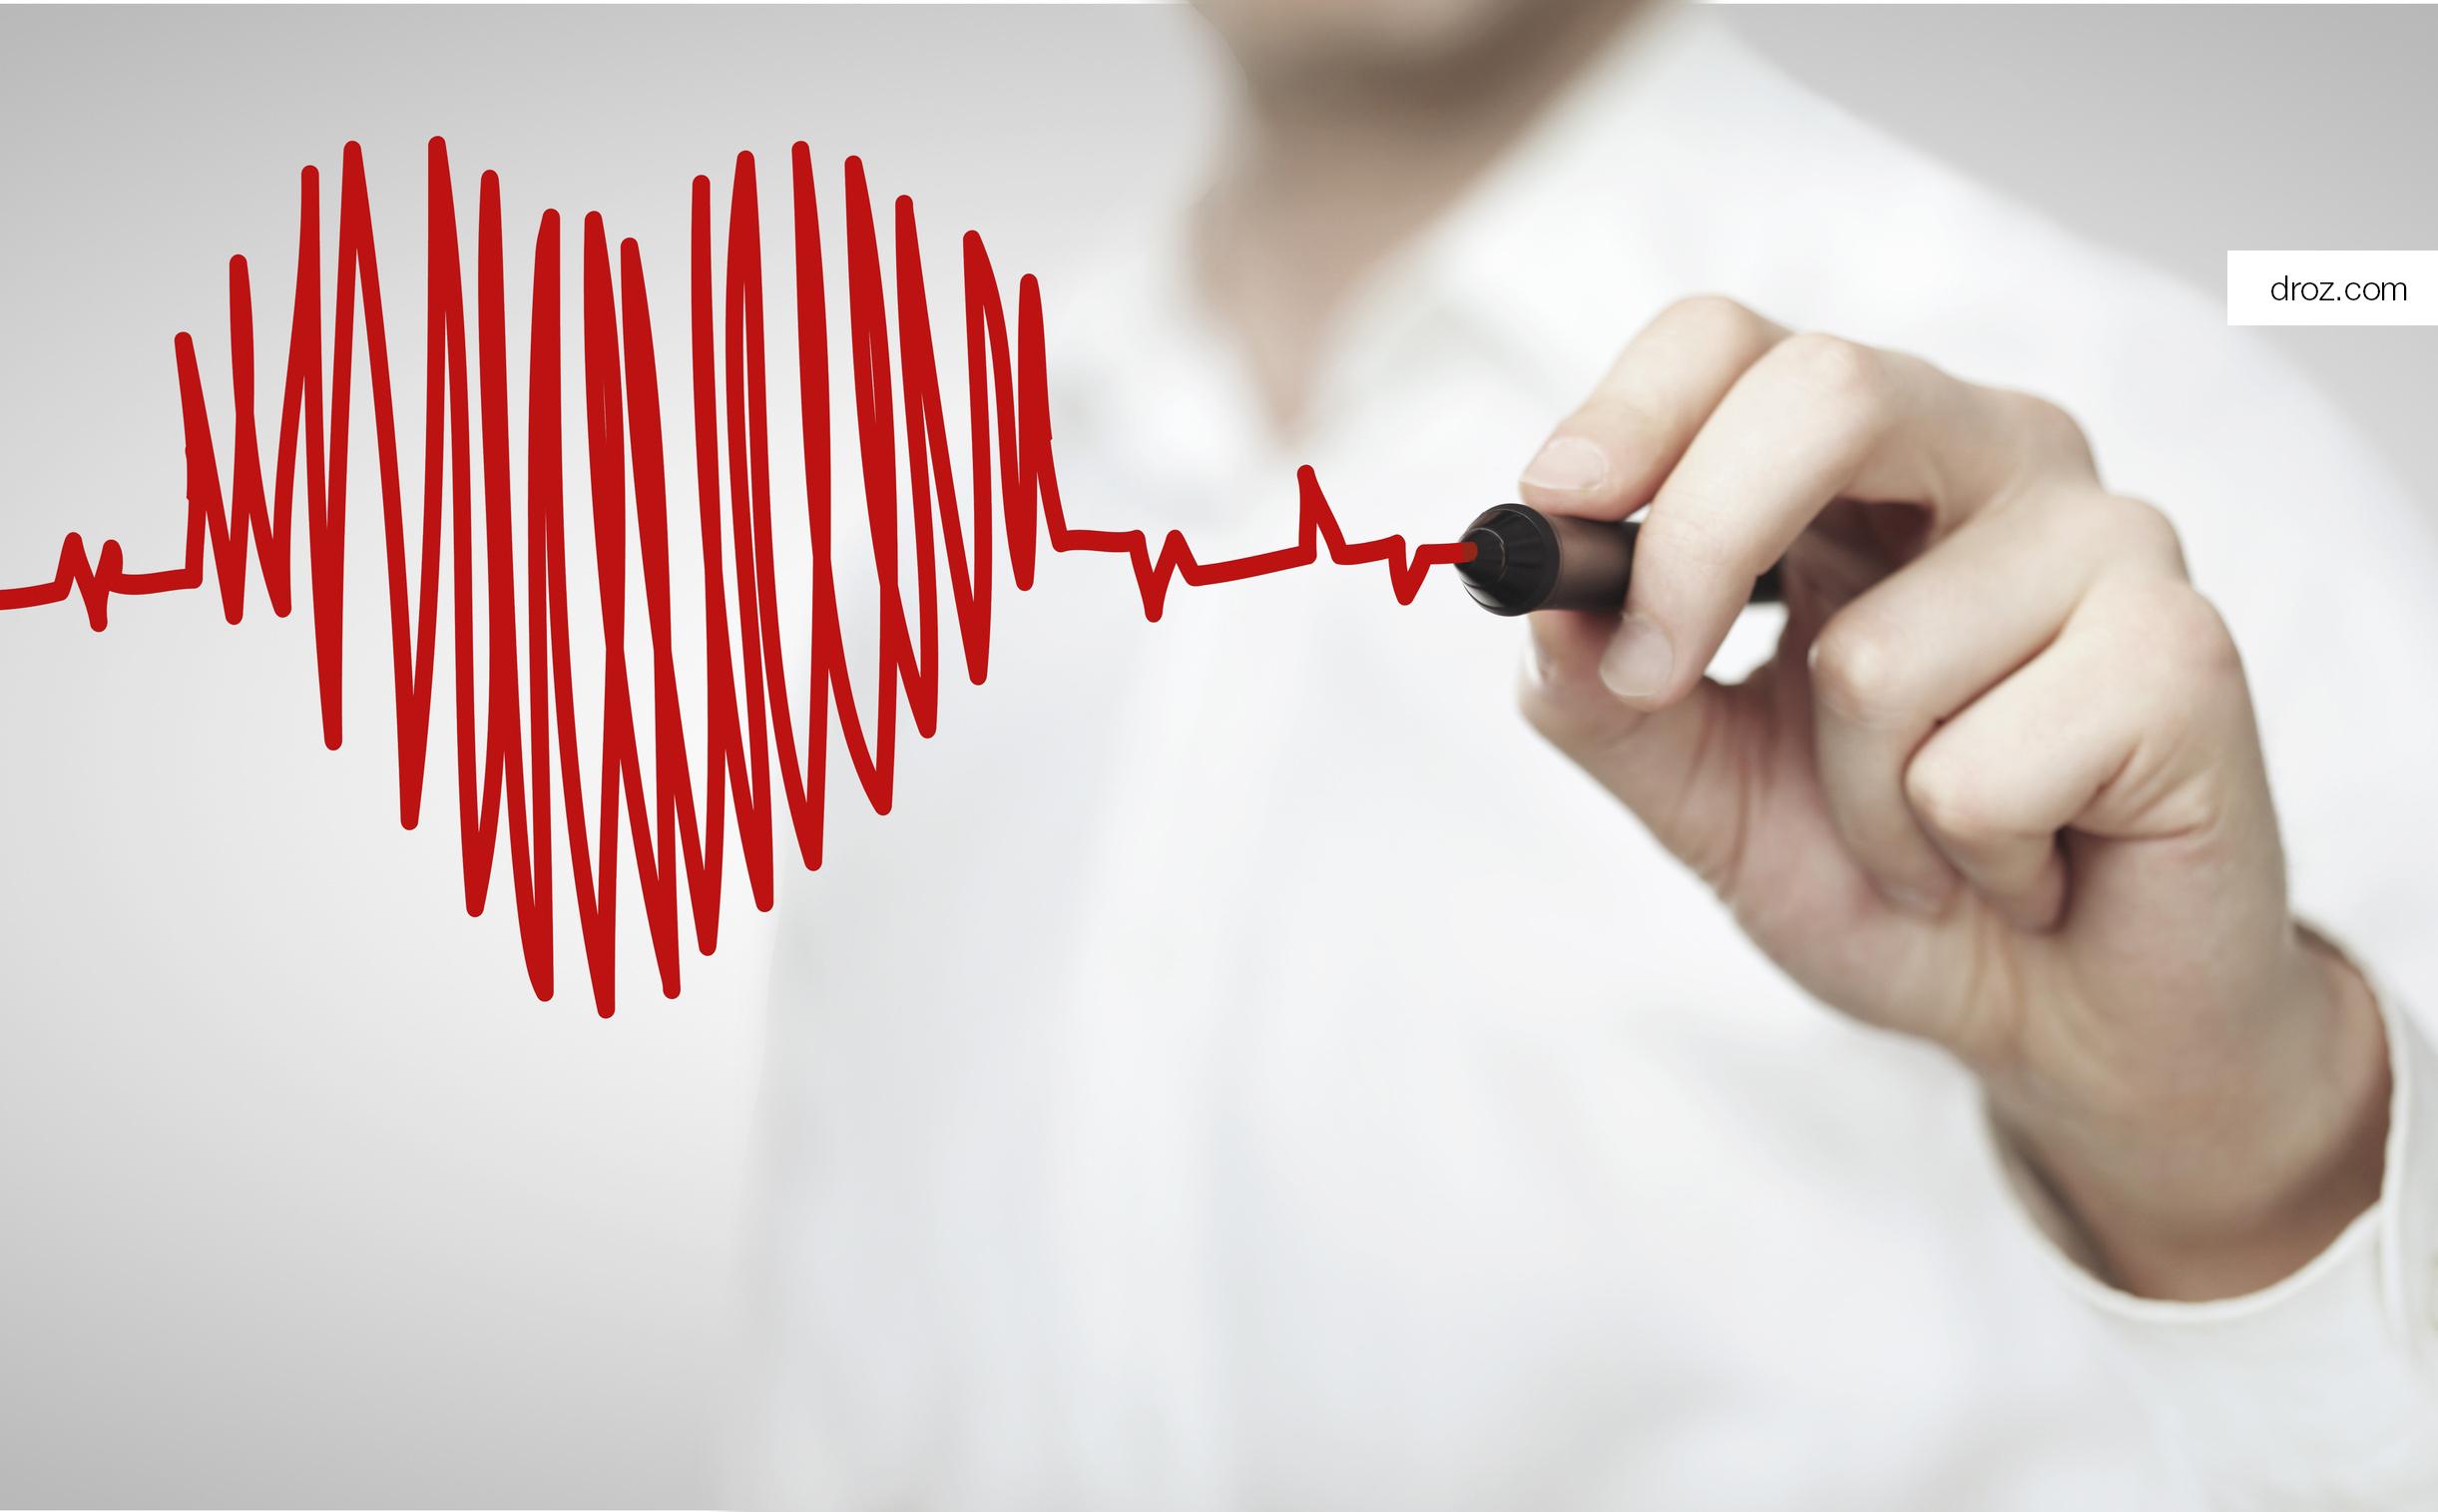 New Study: Vitamin D3 Improves Heart Function